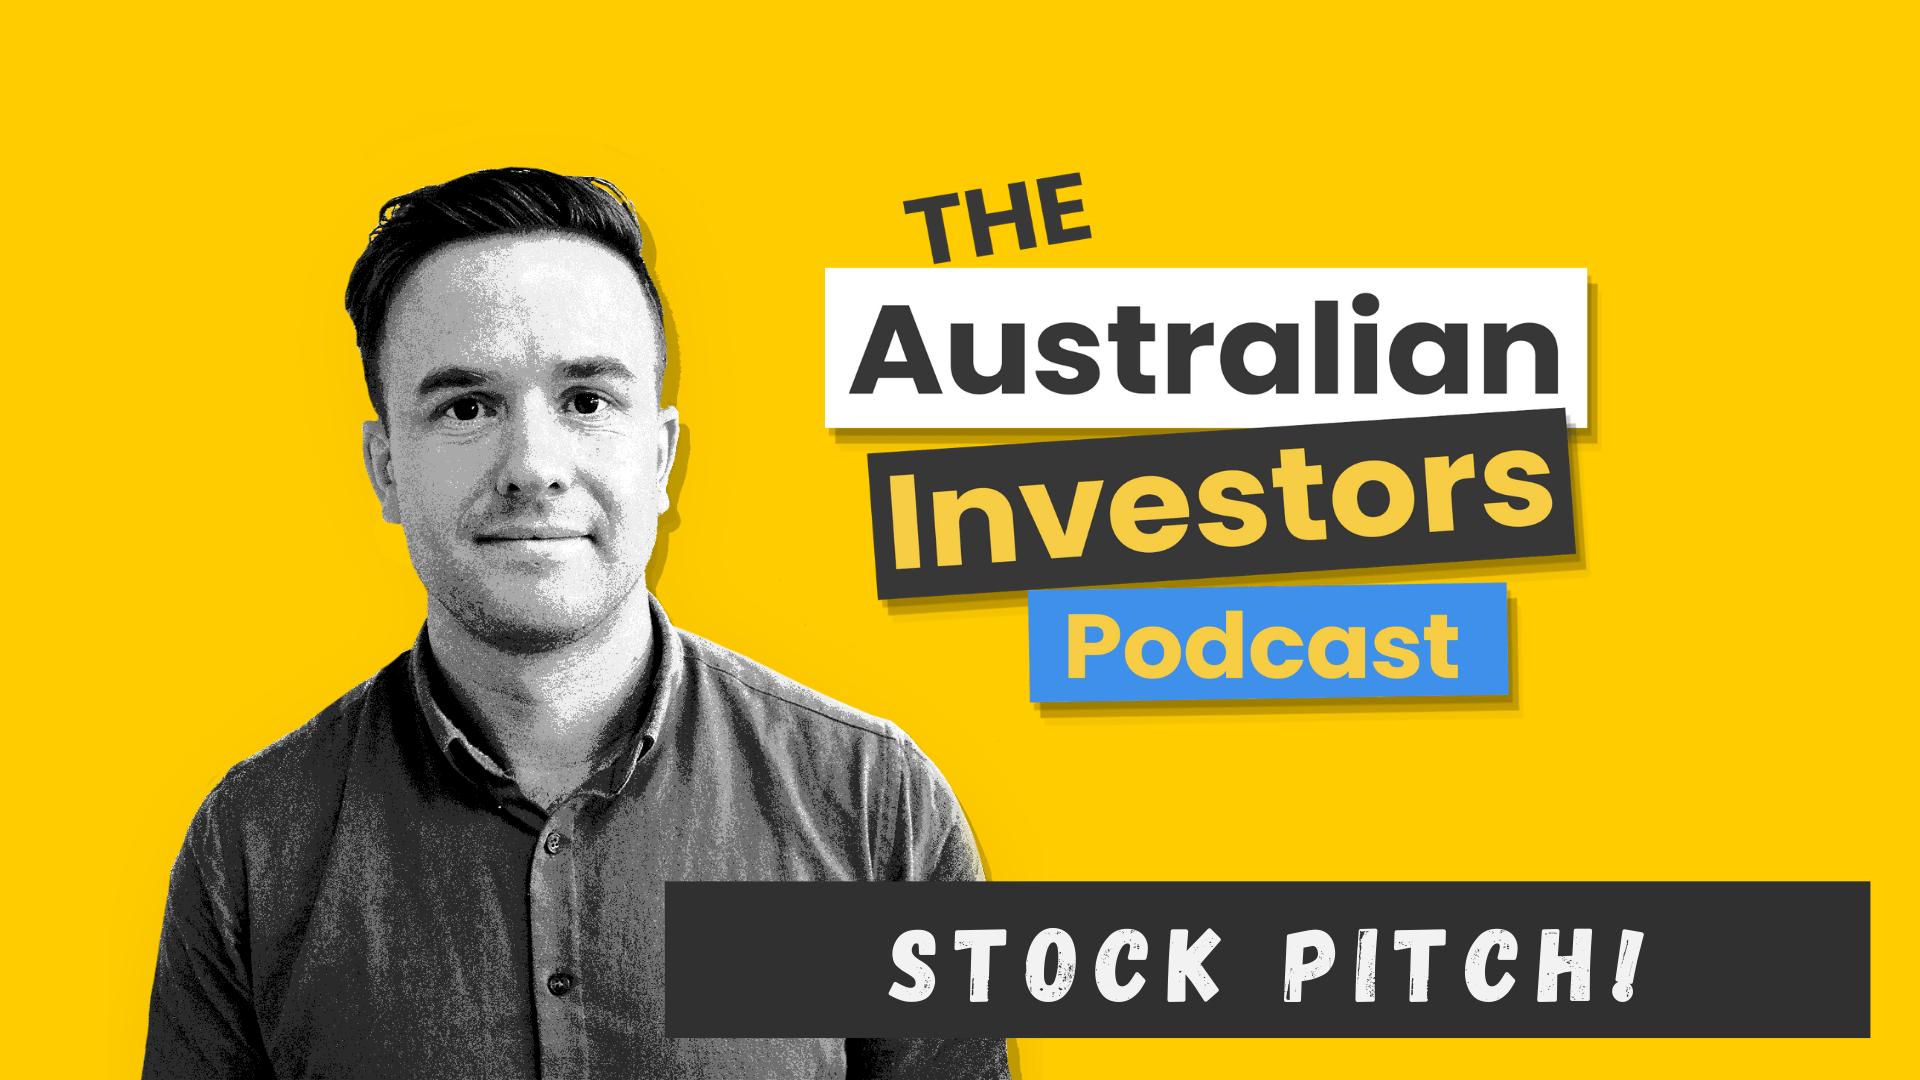 Australian investors podcast stock pitch logo